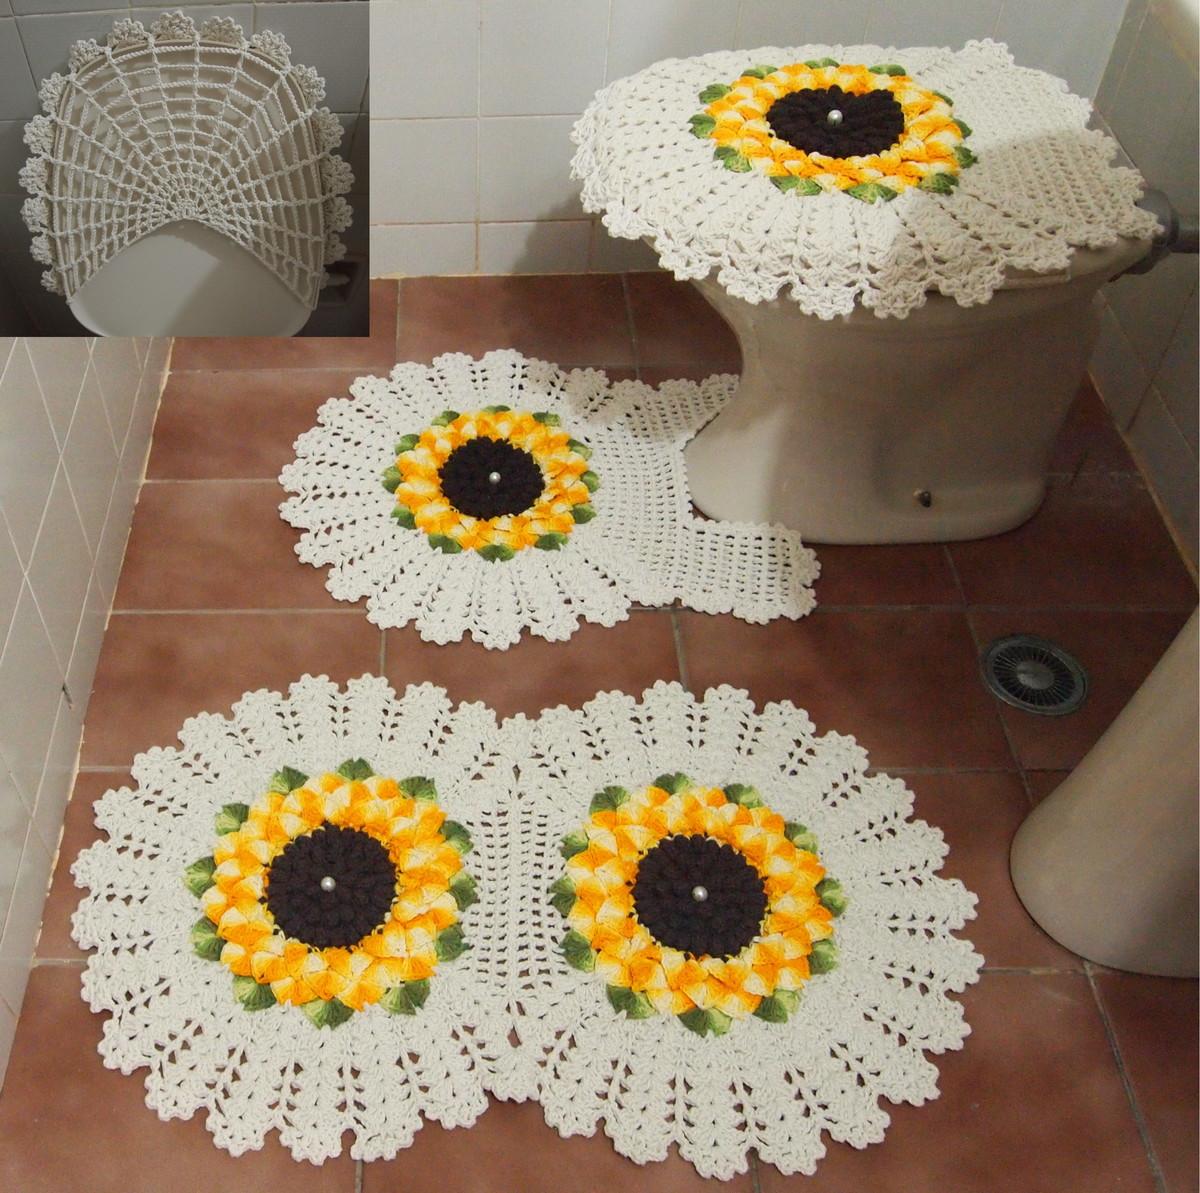 Fotos de tapetes de croche simples tattoo design bild for Tapetes de crochet